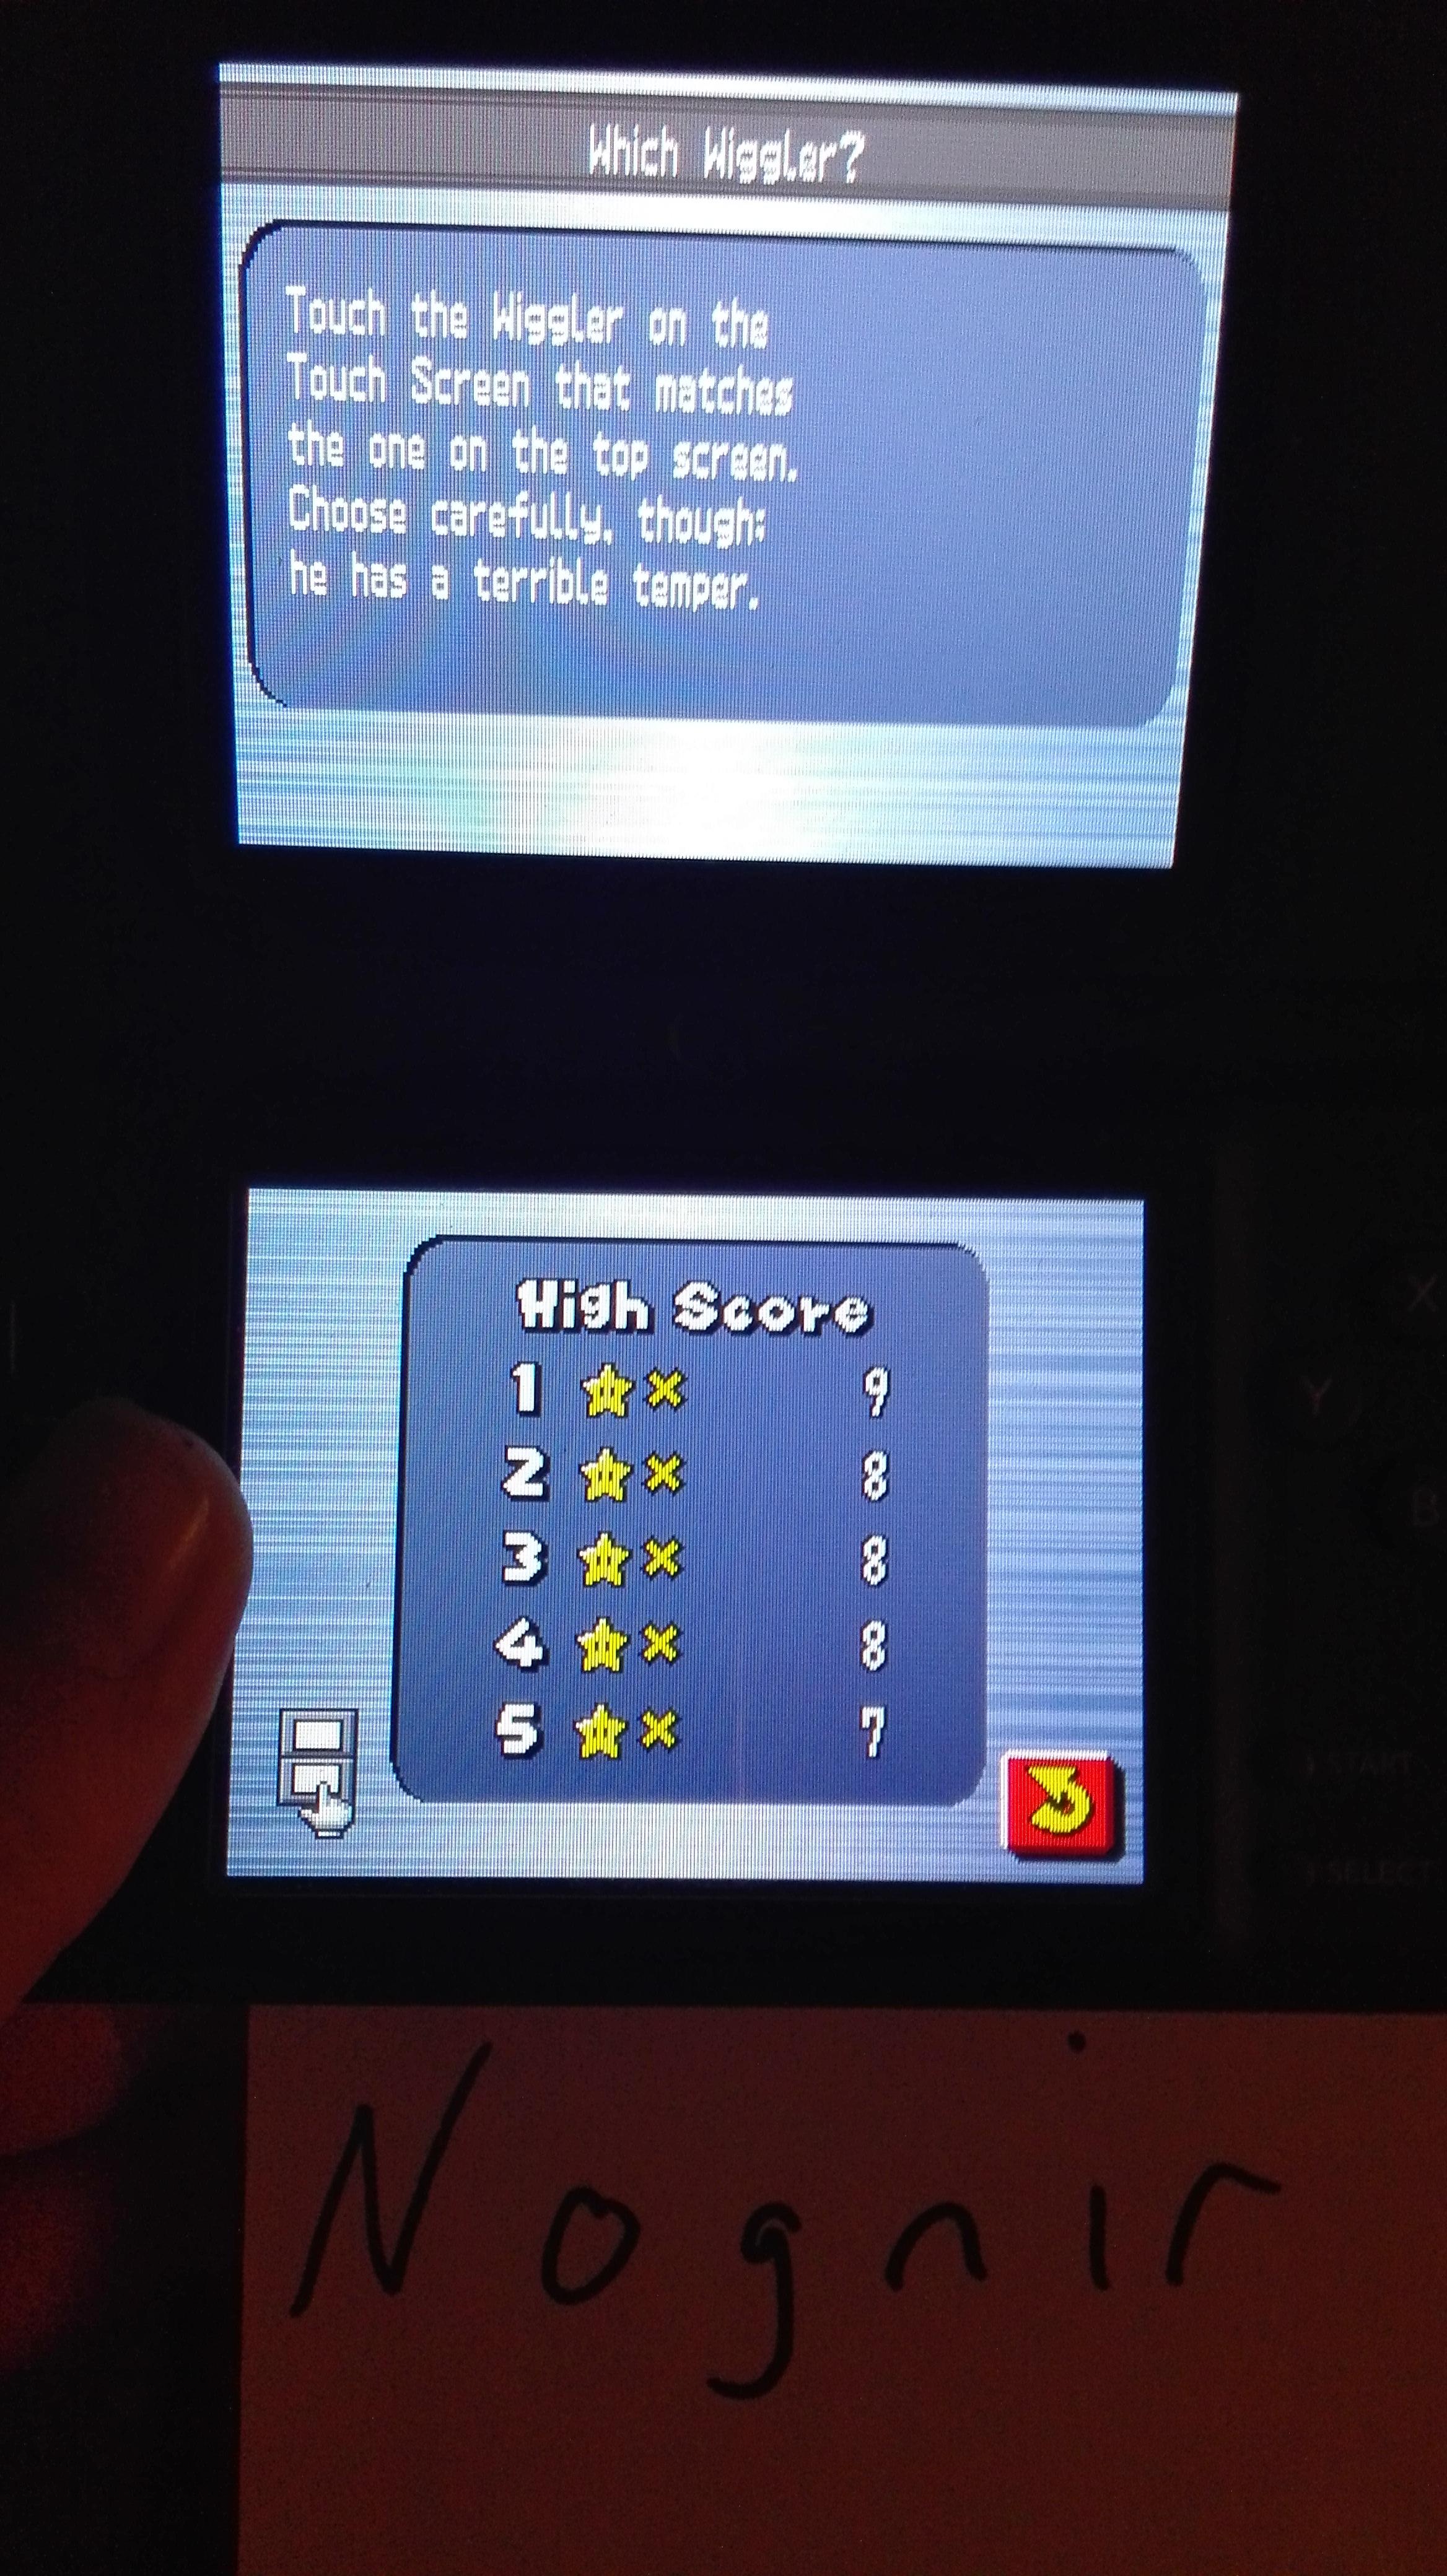 Nognir: New Super Mario Bros.: Which Wiggler? (Nintendo DS) 9 points on 2016-02-18 14:15:40